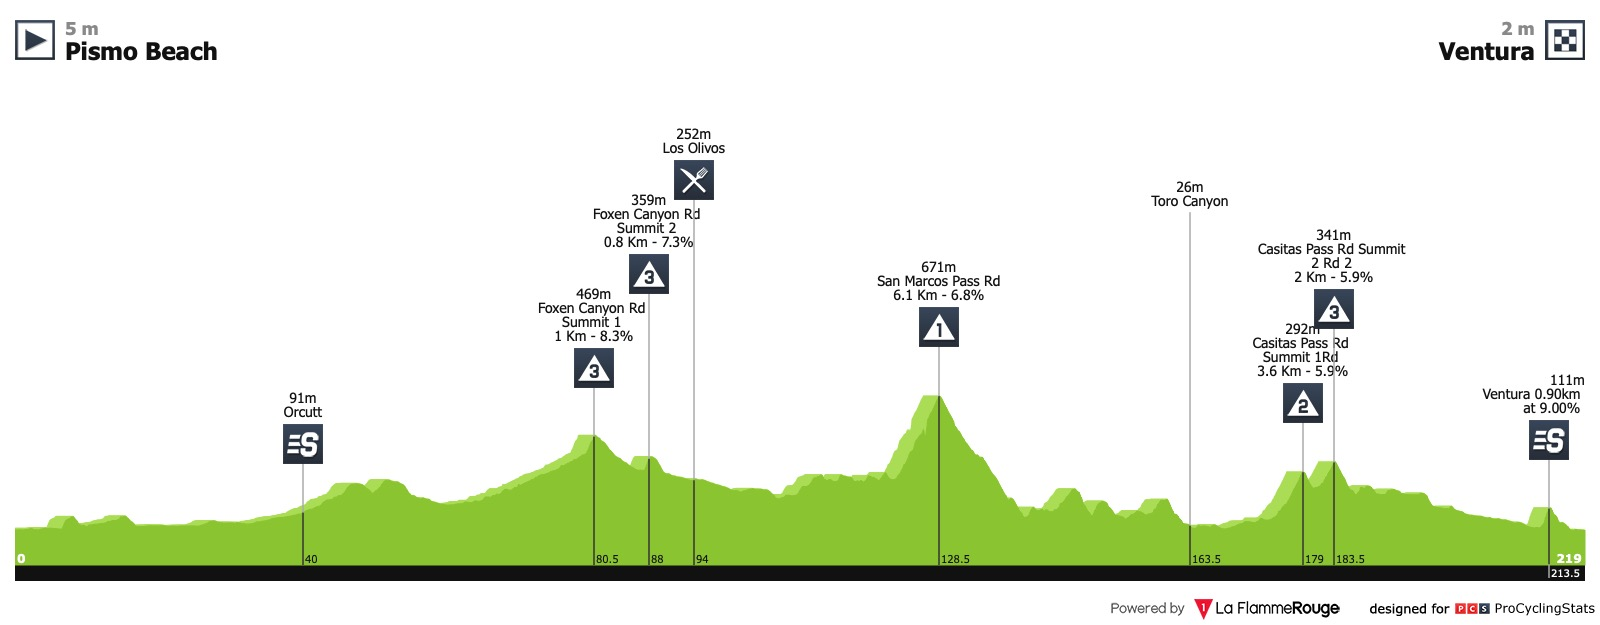 Amgen Tour of California 2019 Tour-of-california-2019-stage-5-profile-90b046ae35